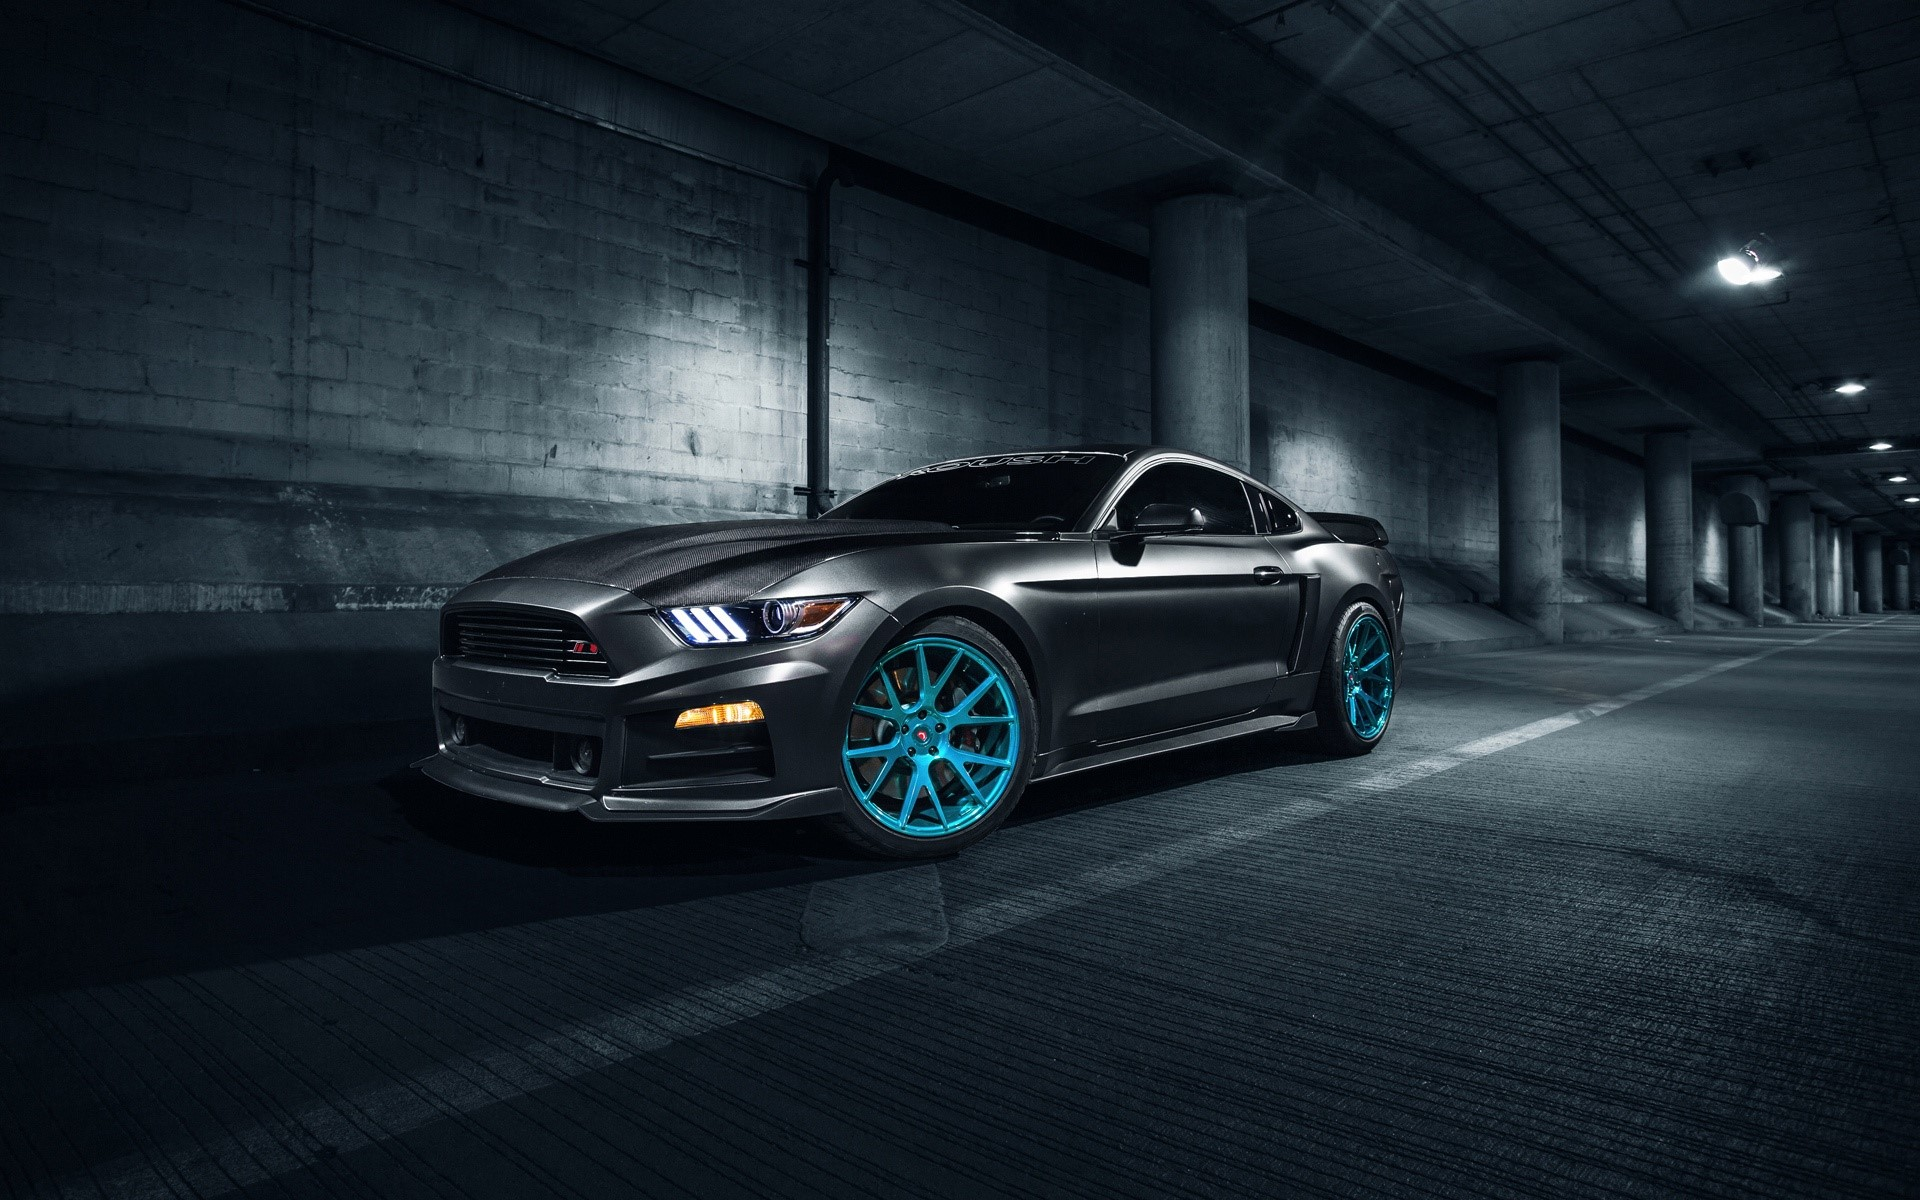 Fondo de pantalla de Roush Performance Mustang Vossen Wheels Imágenes